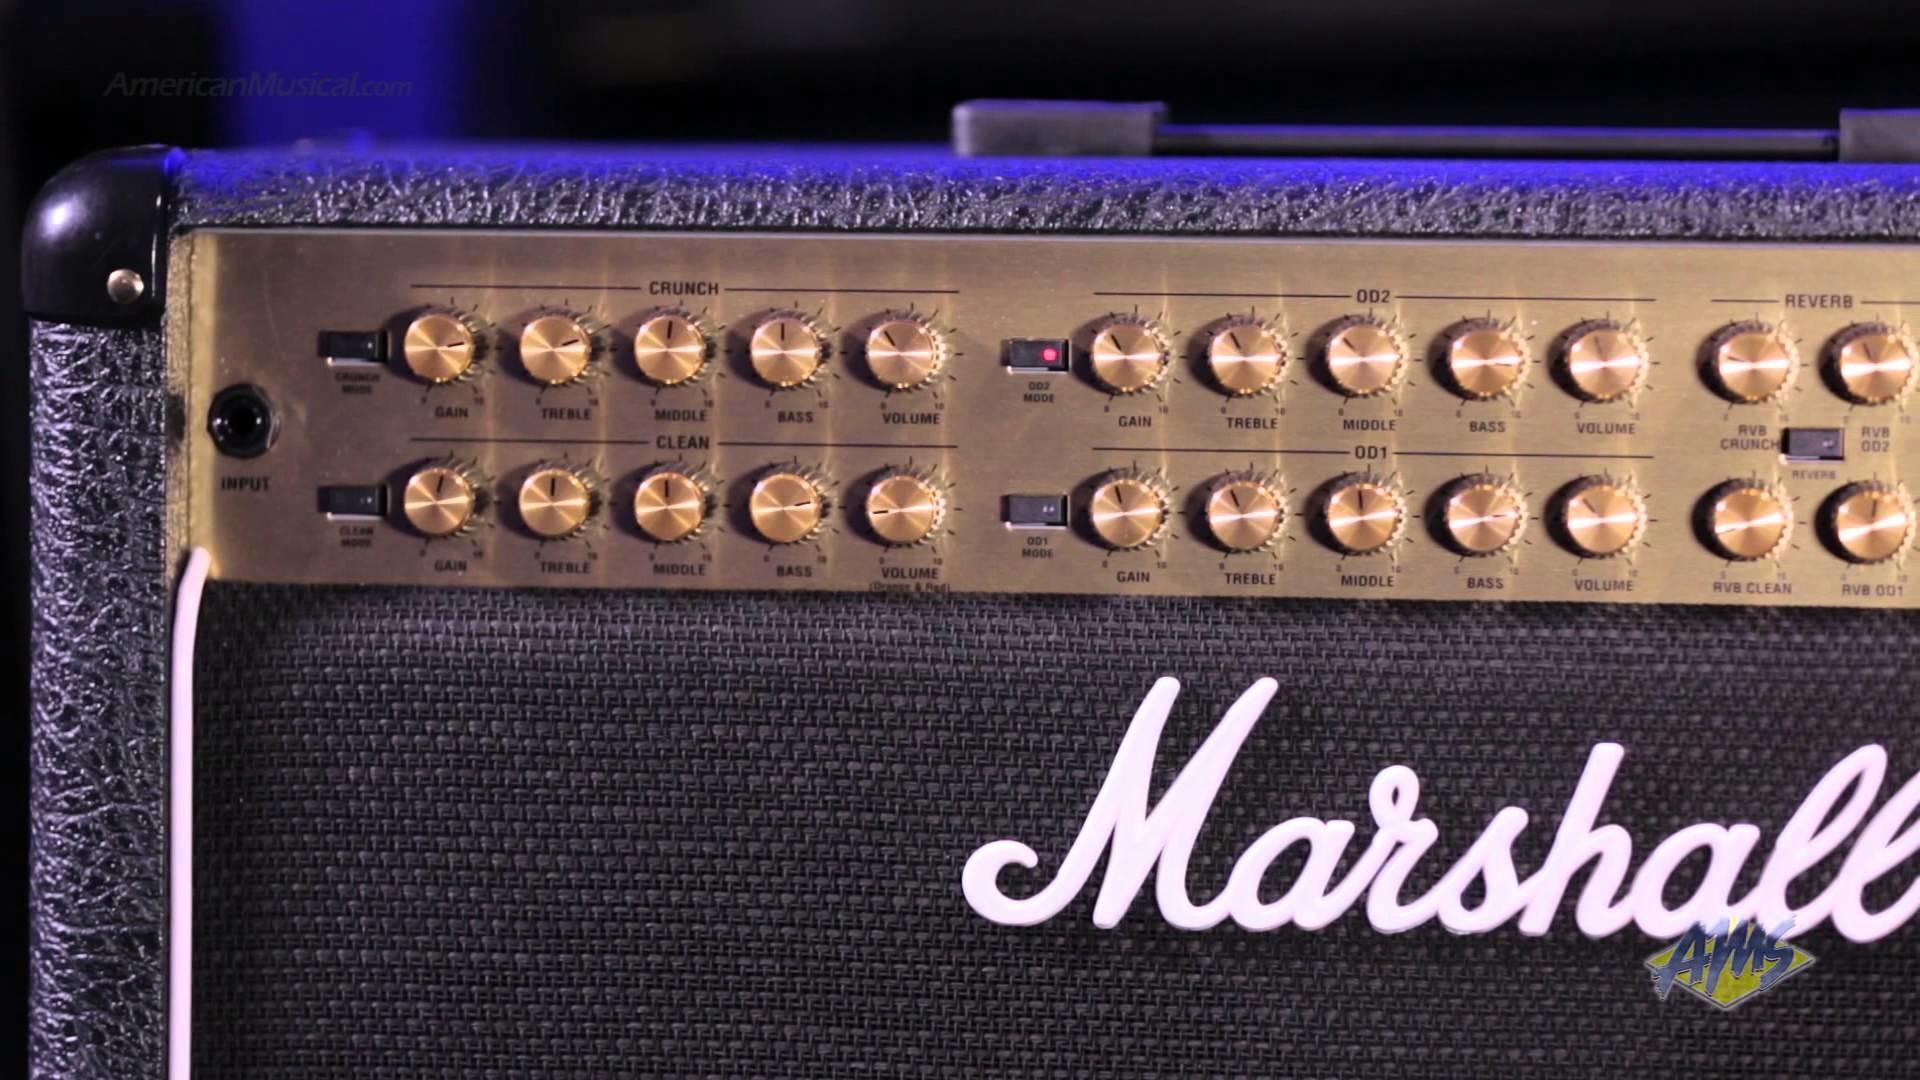 41 Marshall Amp